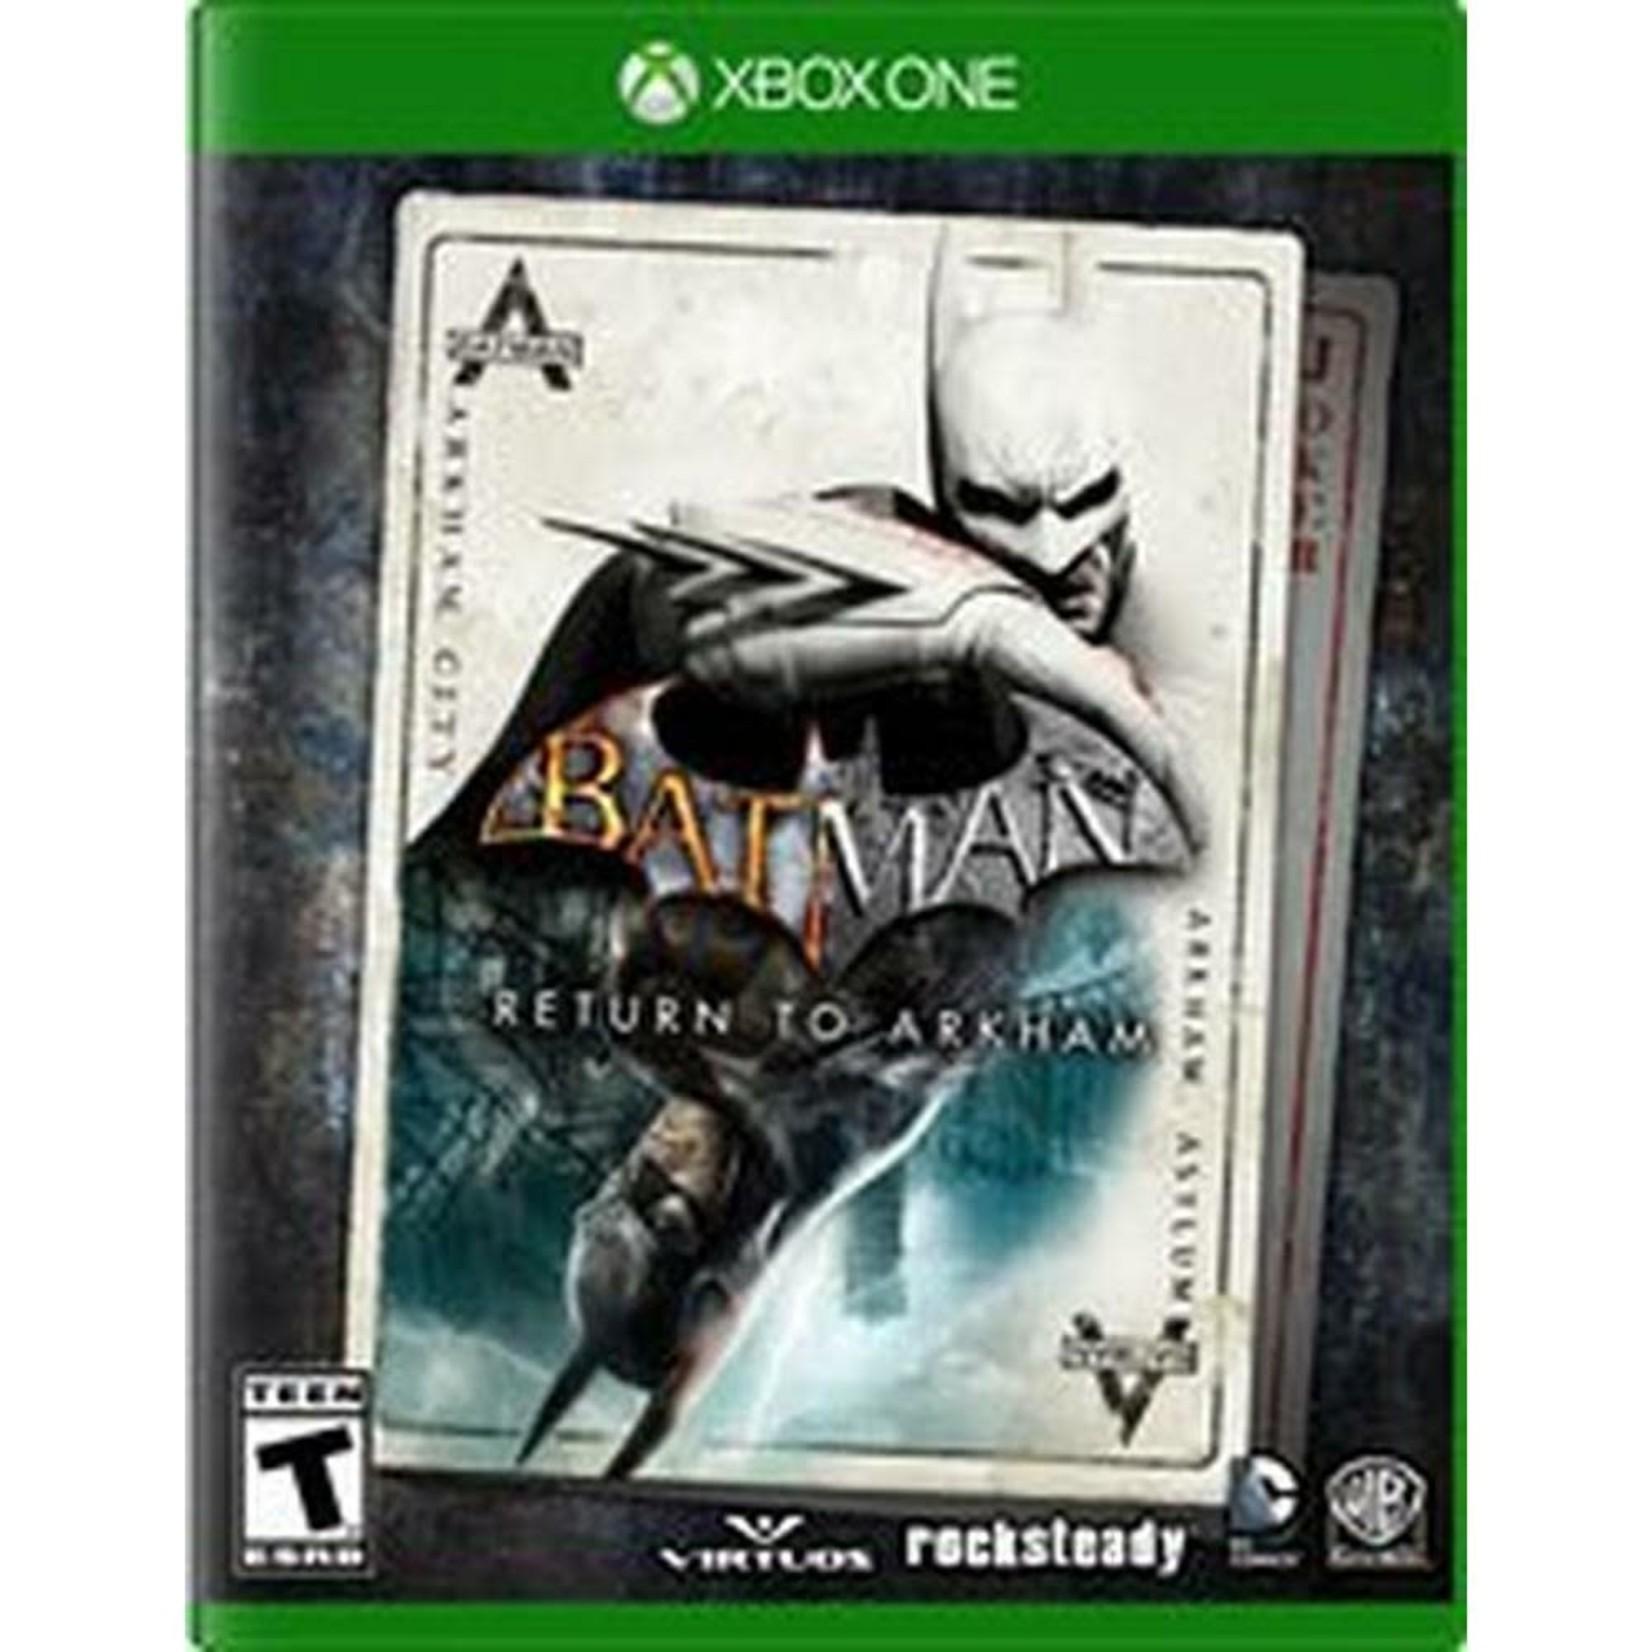 XB1U-Batman: Return to Arkham